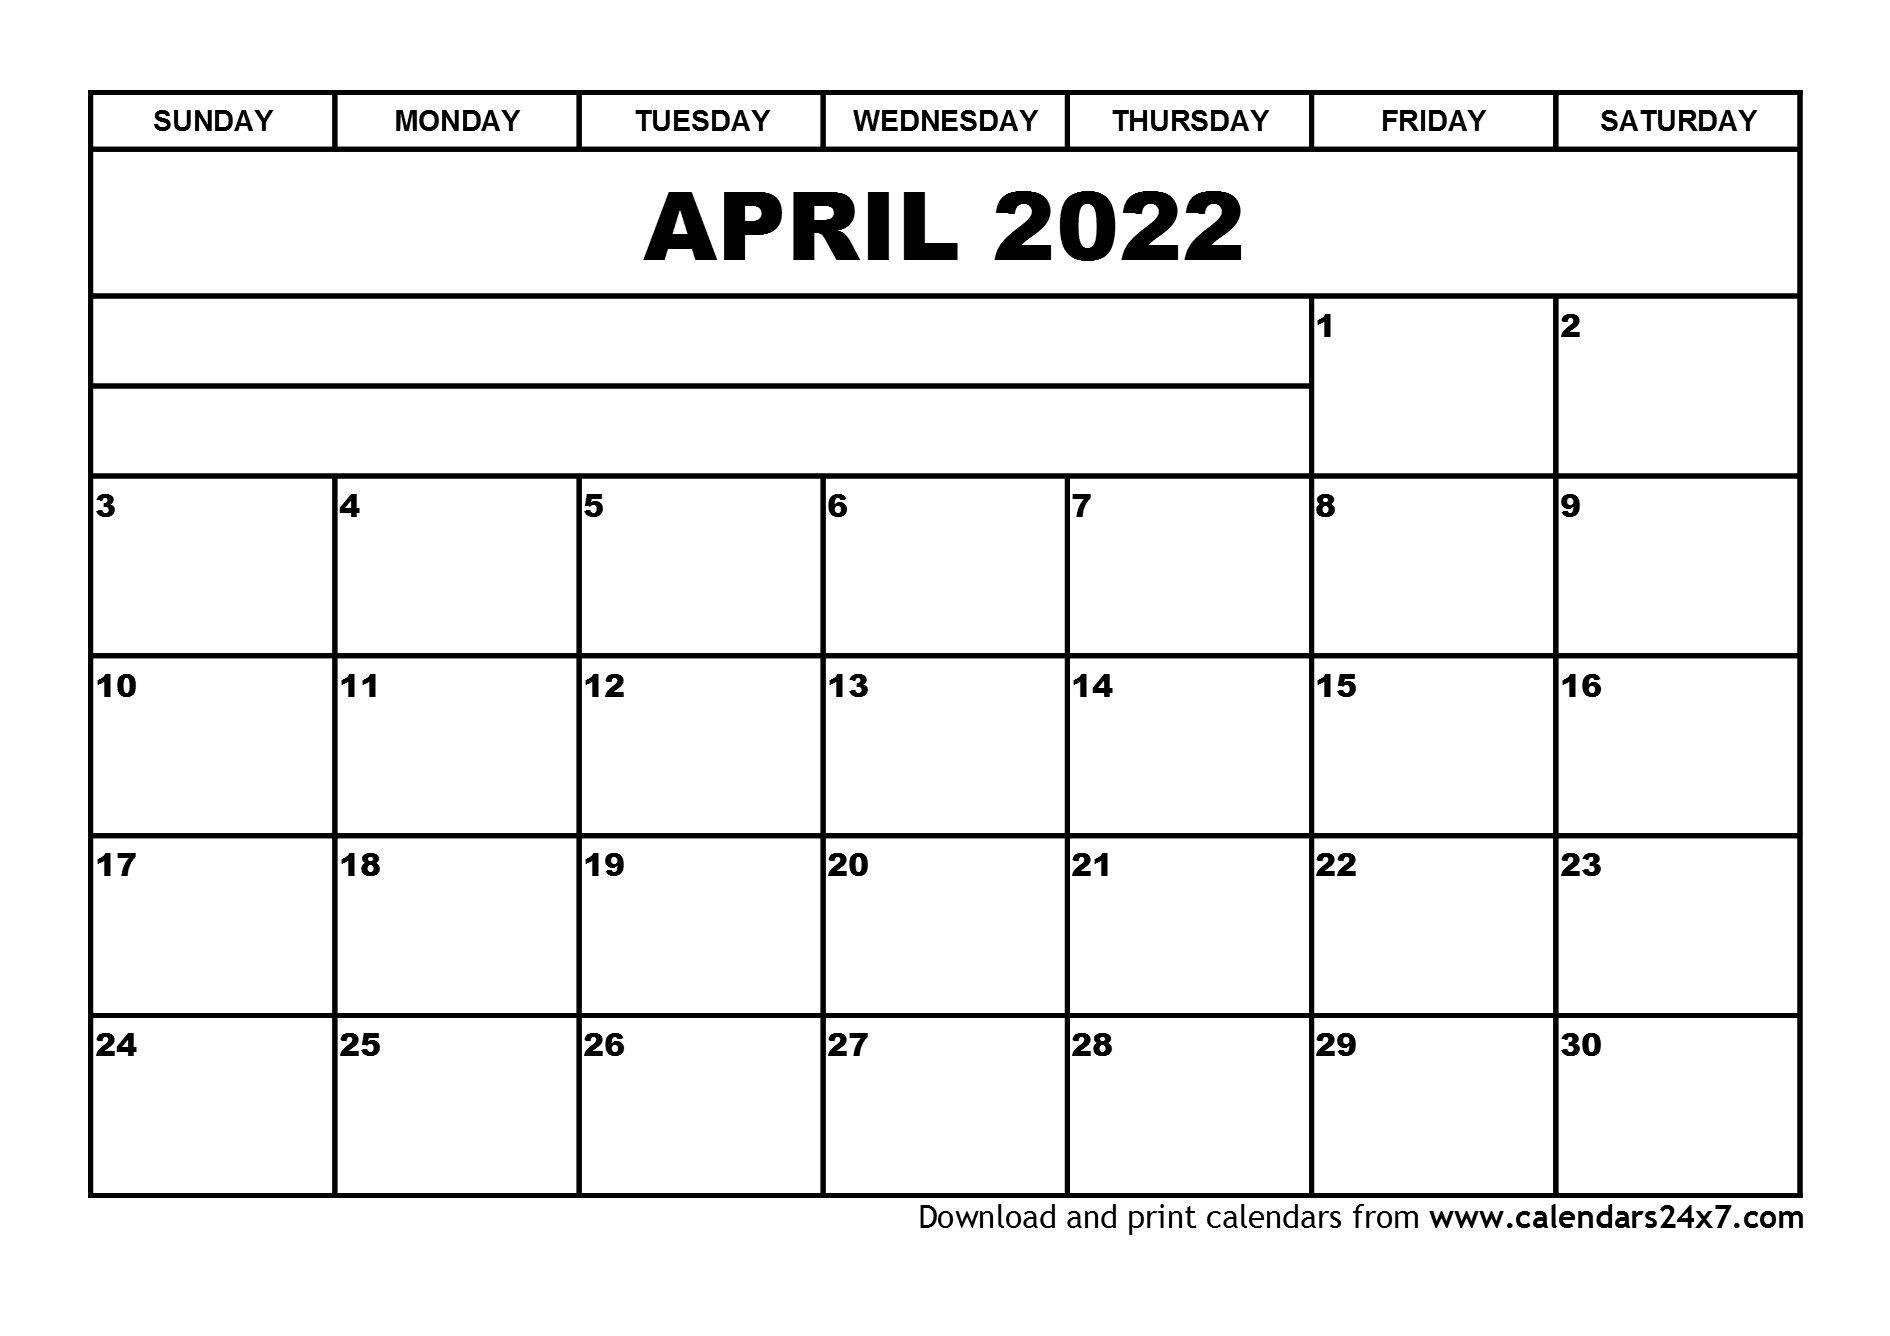 April 2022 Calendar & May 2022 Calendar Regarding March April May June Calendar 2022